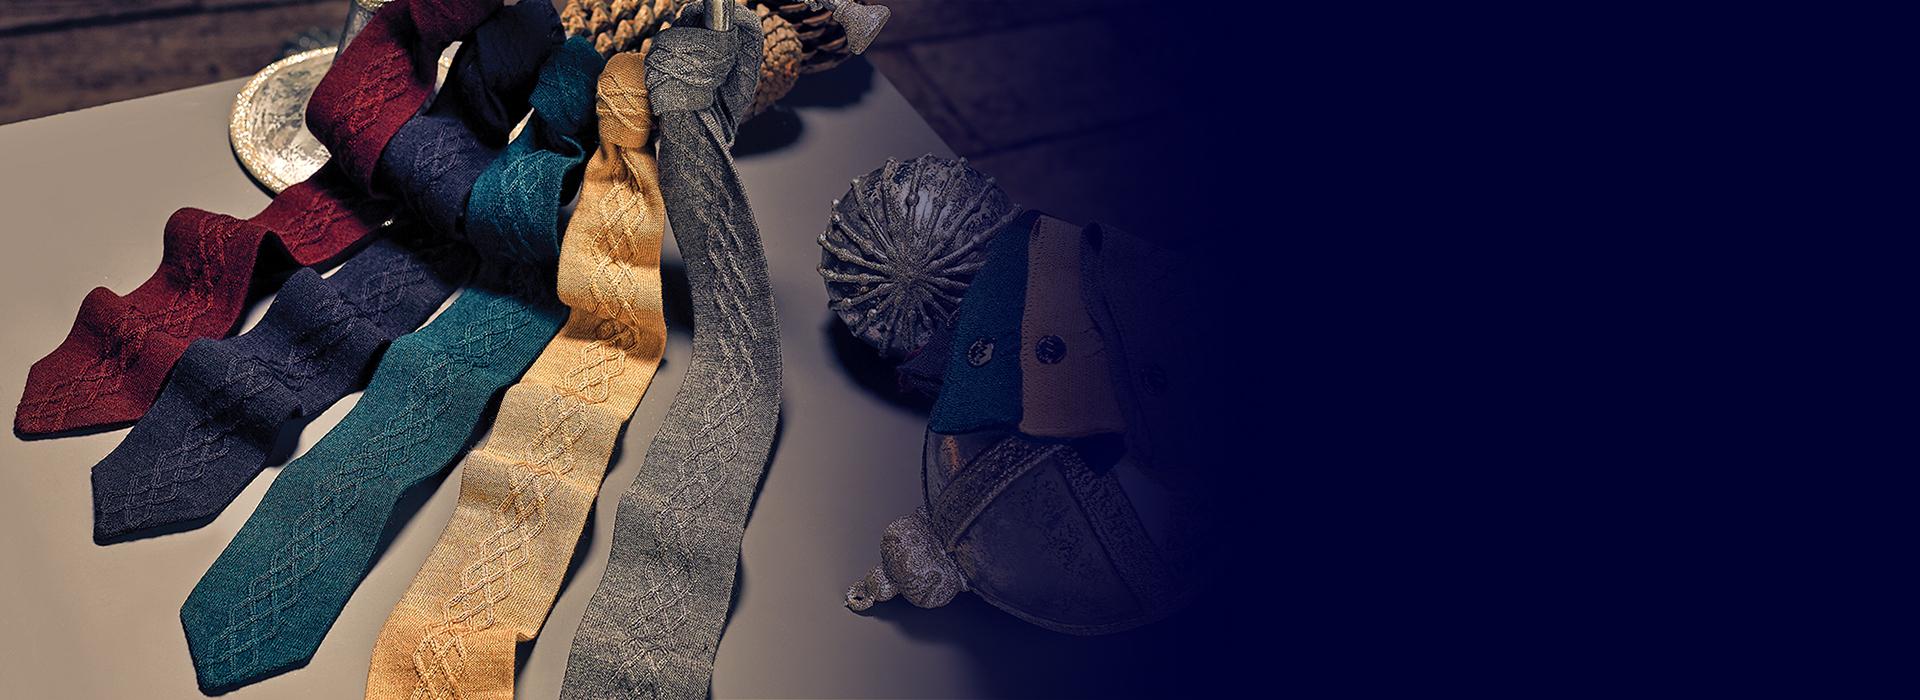 Kravat & Mendil Koleksiyonu